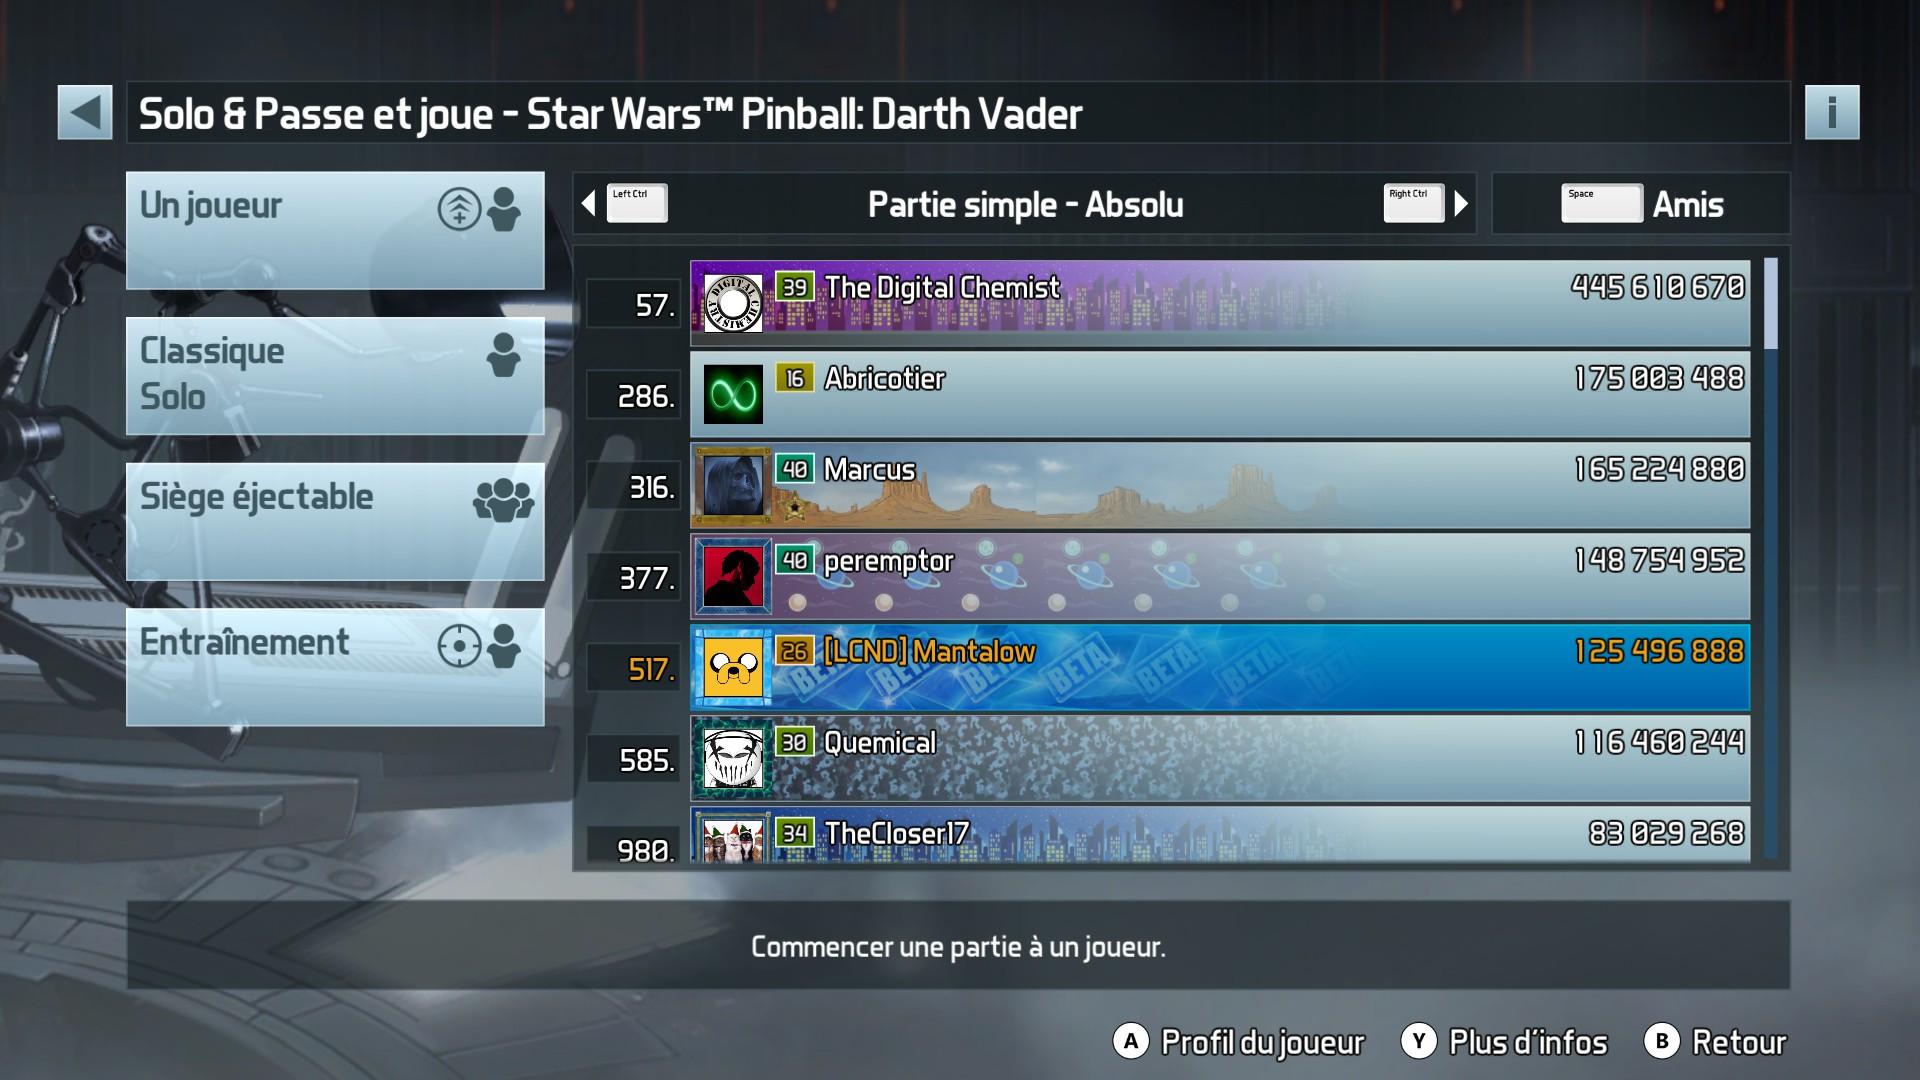 Mantalow: Pinball FX3: Star Wars Pinball: Darth Vader (PC) 125,496,888 points on 2017-12-19 04:42:40